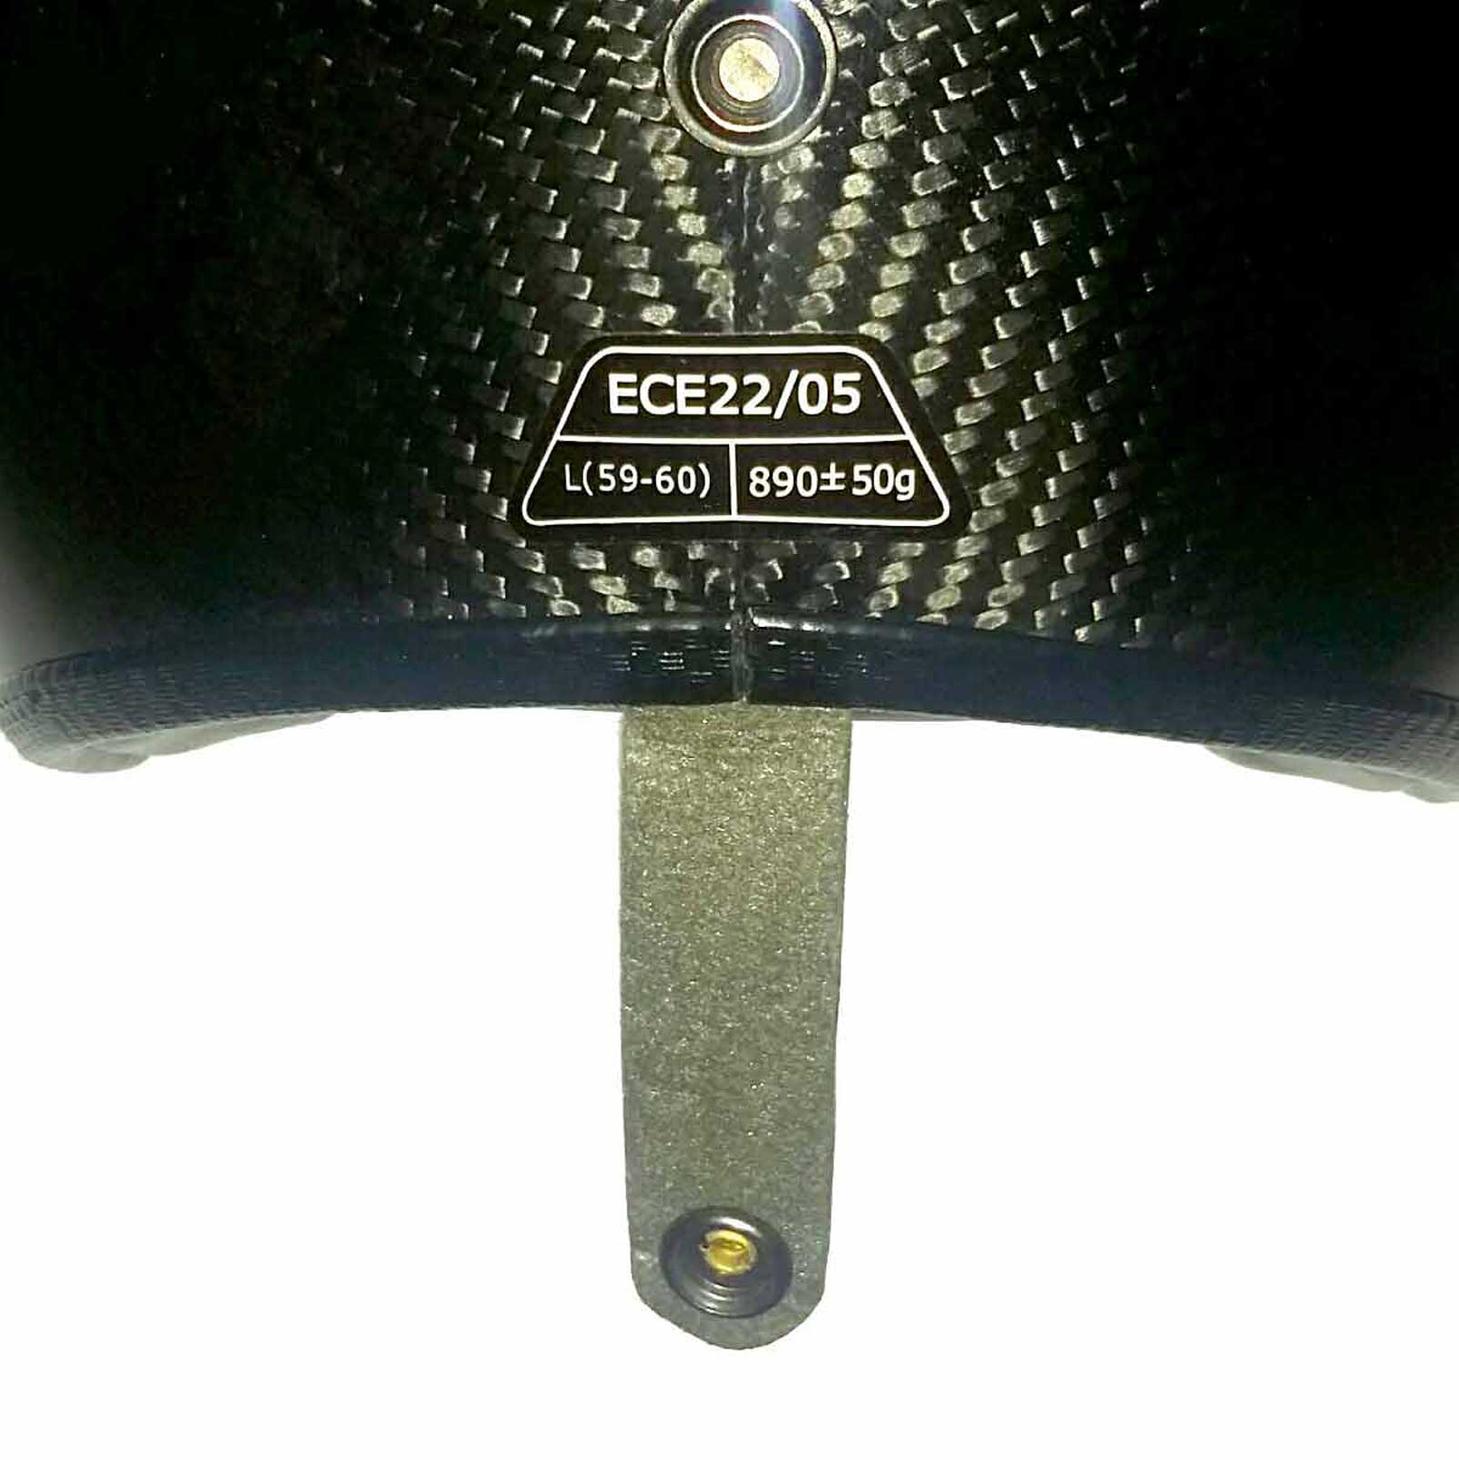 ECE-certified Carbon jet helmet by Bandit Helmets – Picture 5